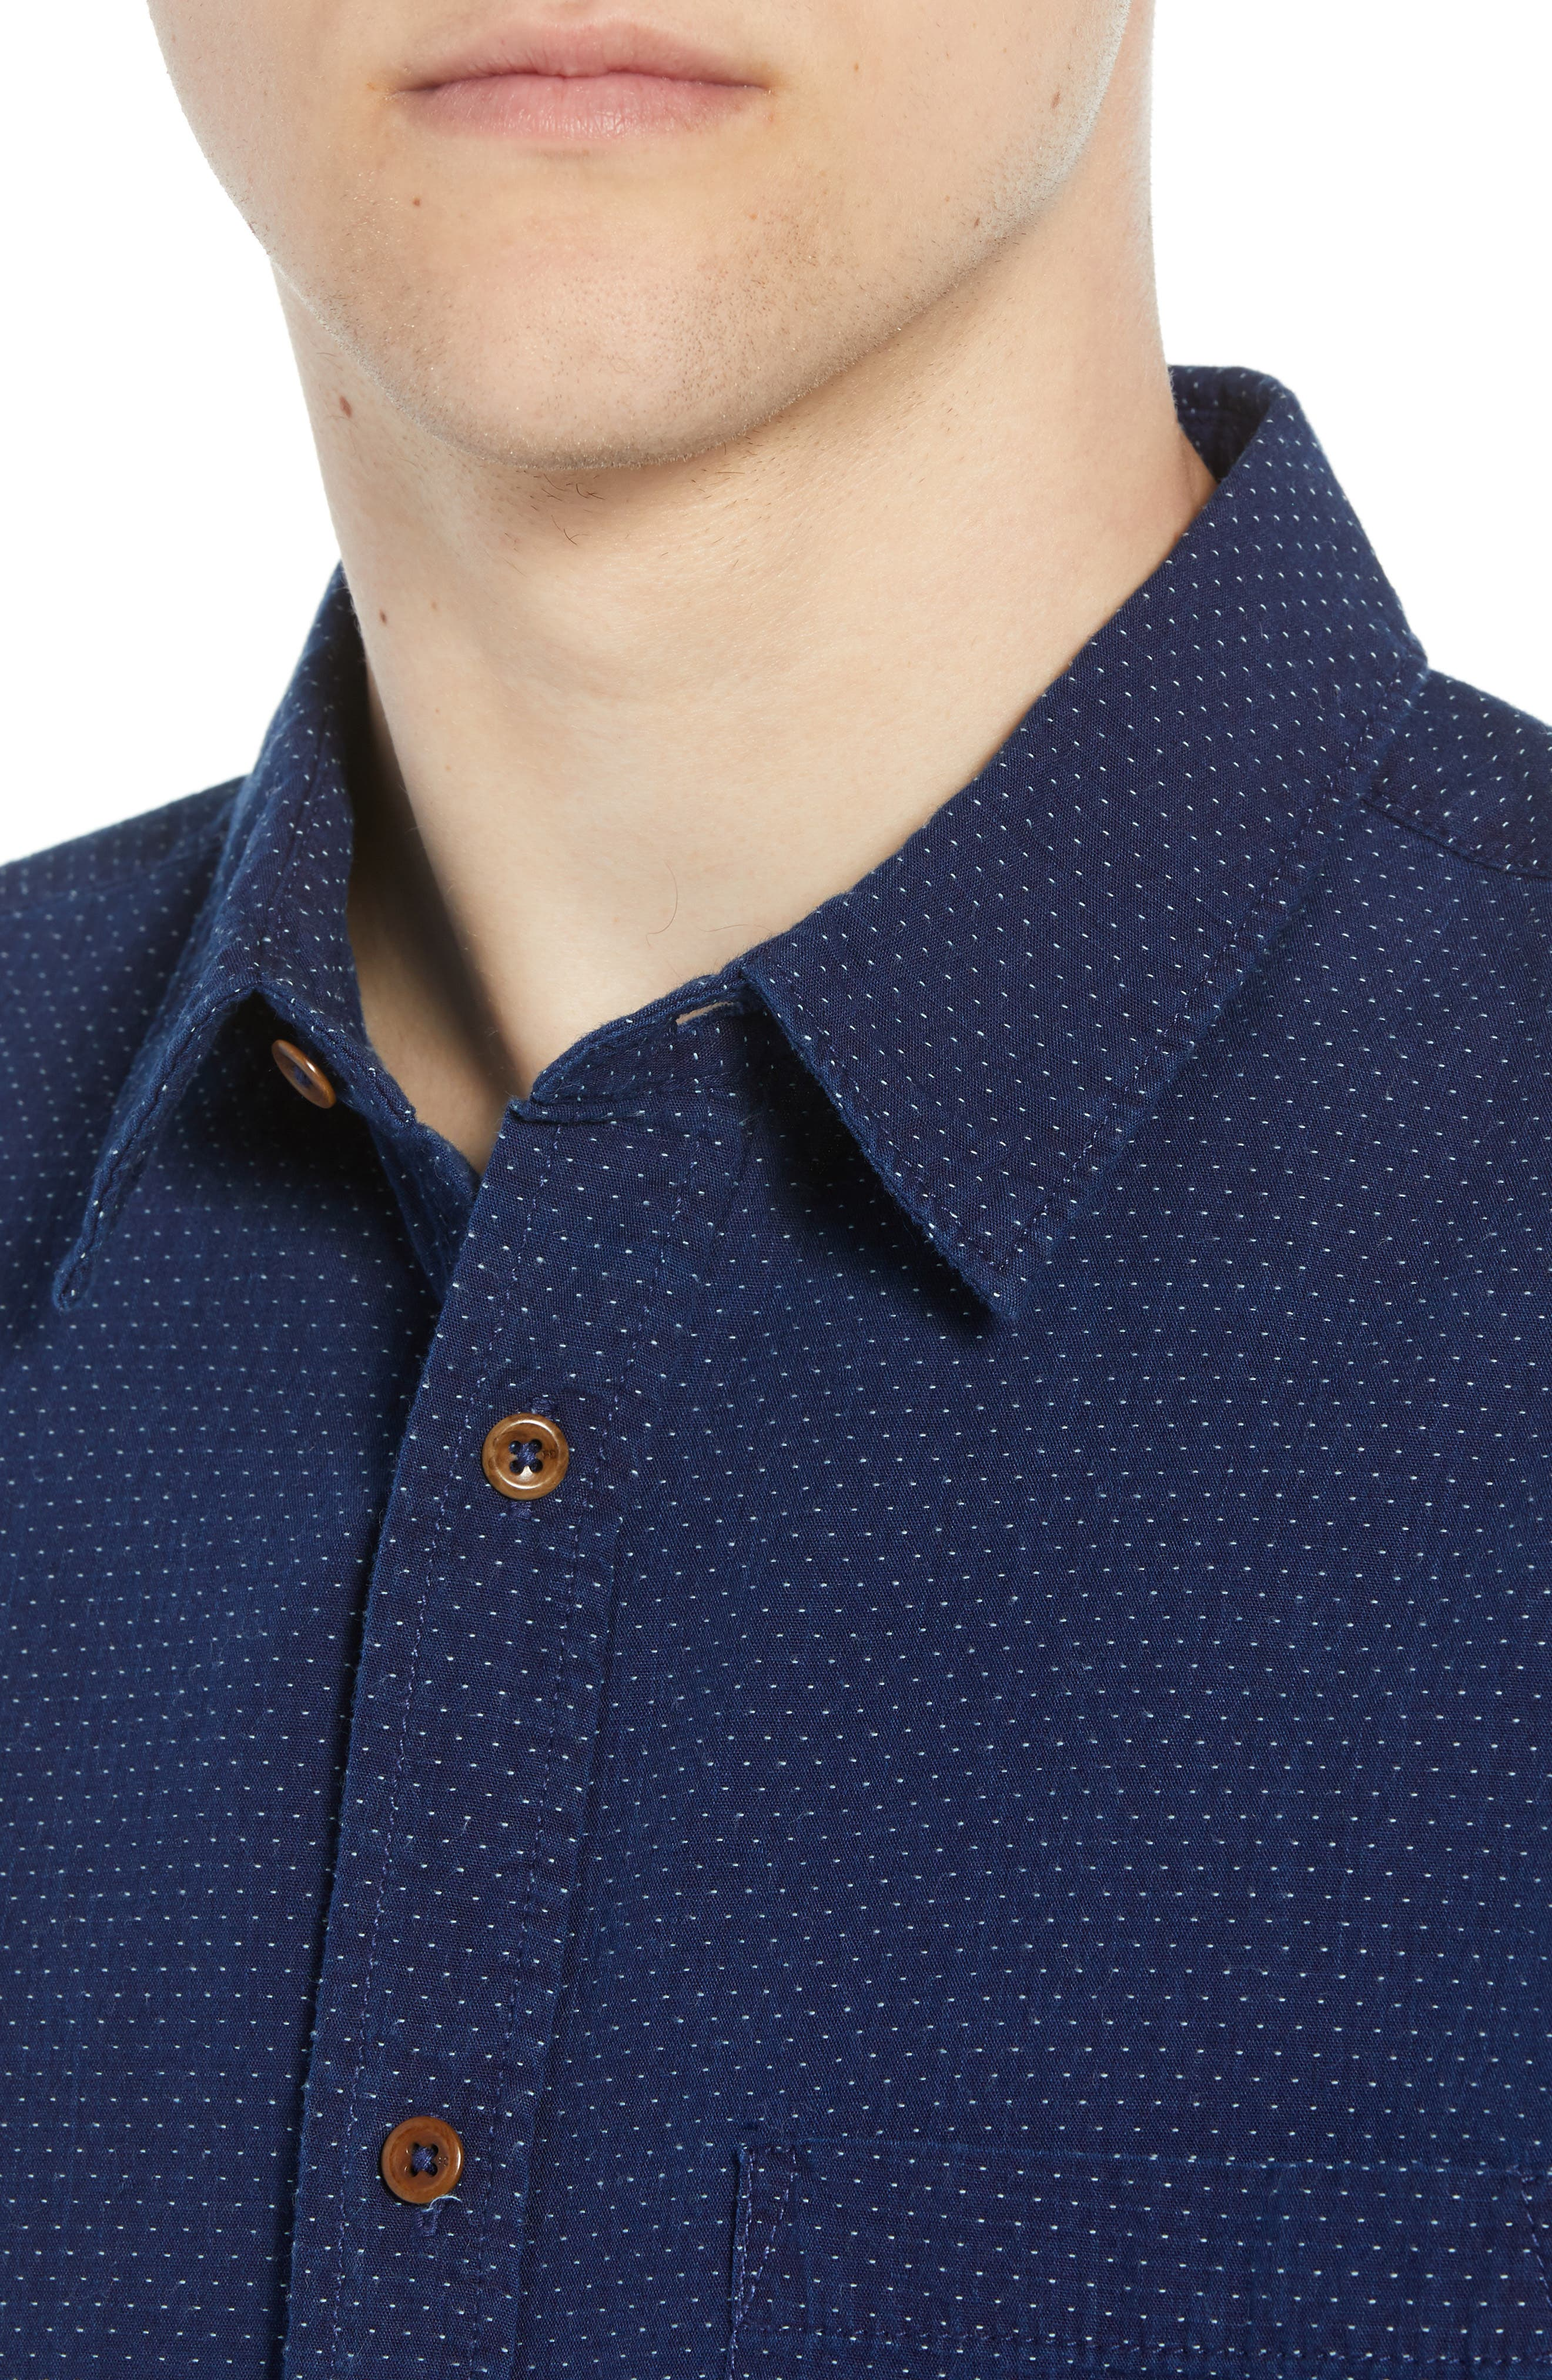 Indigo Dot Regular Fit Sport Shirt,                             Alternate thumbnail 2, color,                             VINTAGE